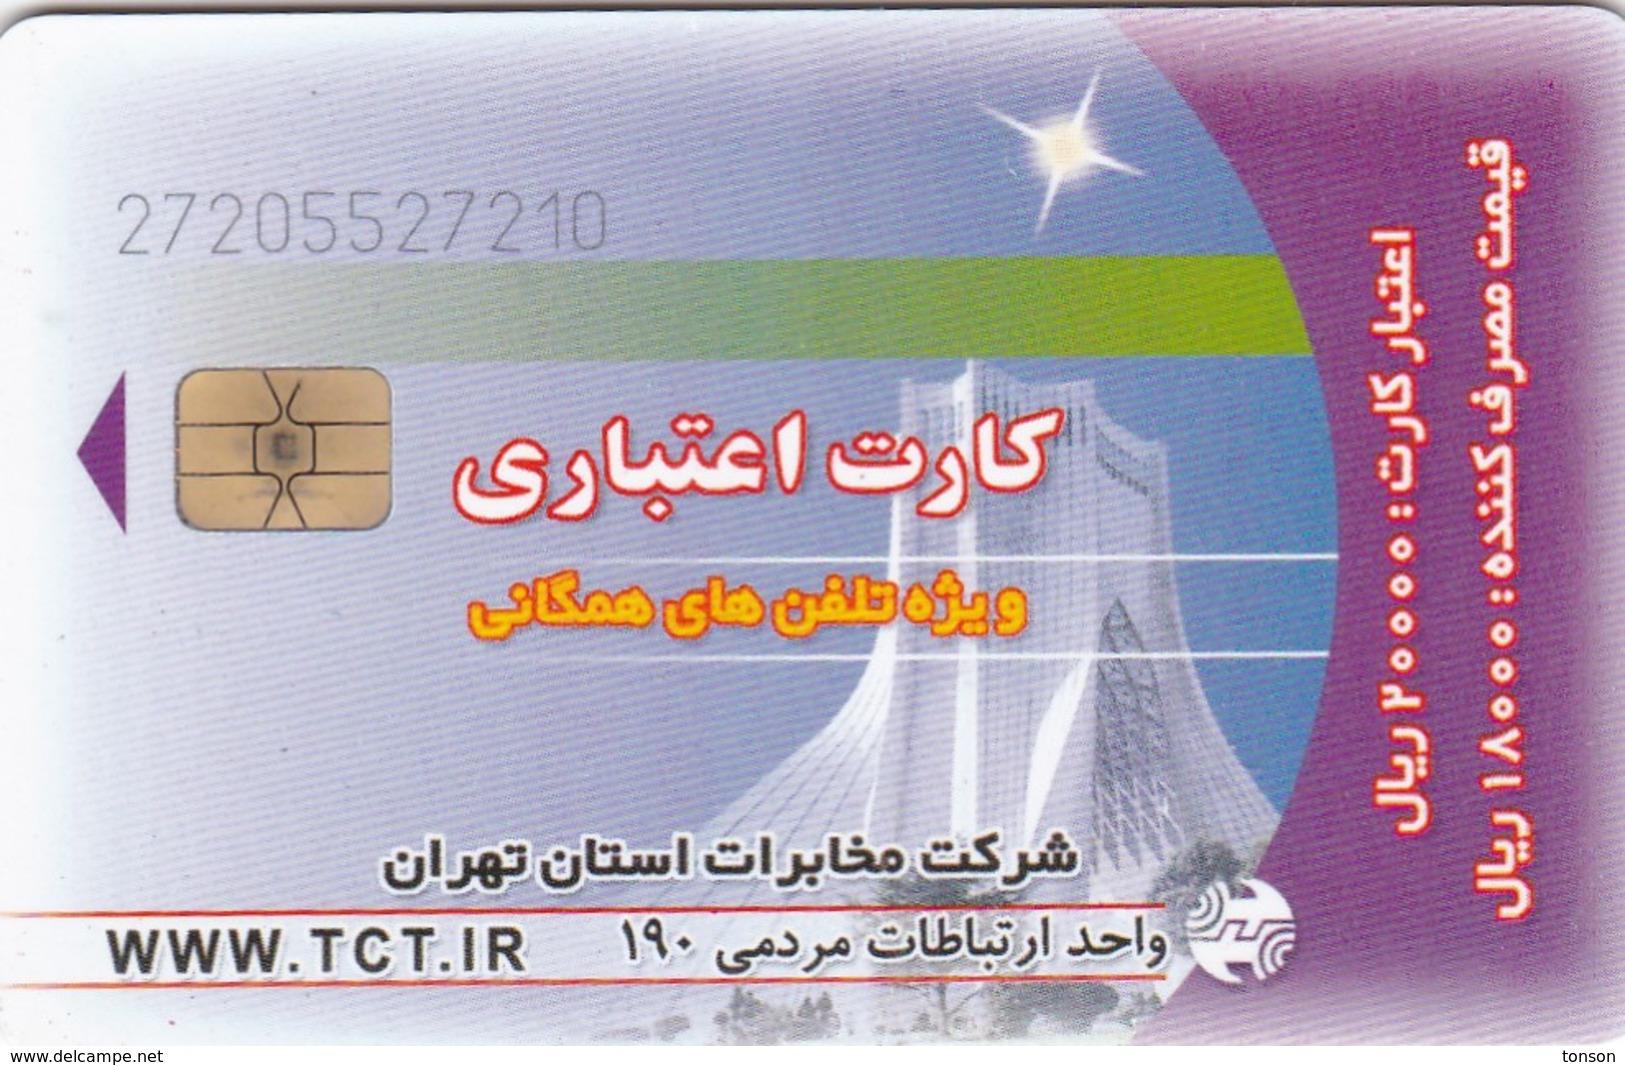 Iran, IR-C-TCT-?, Azadi Square / Phone Number 1818 / ۱۸۱۸ And Man, 2 Scans   Chip :  Incard - IN4 - Iran